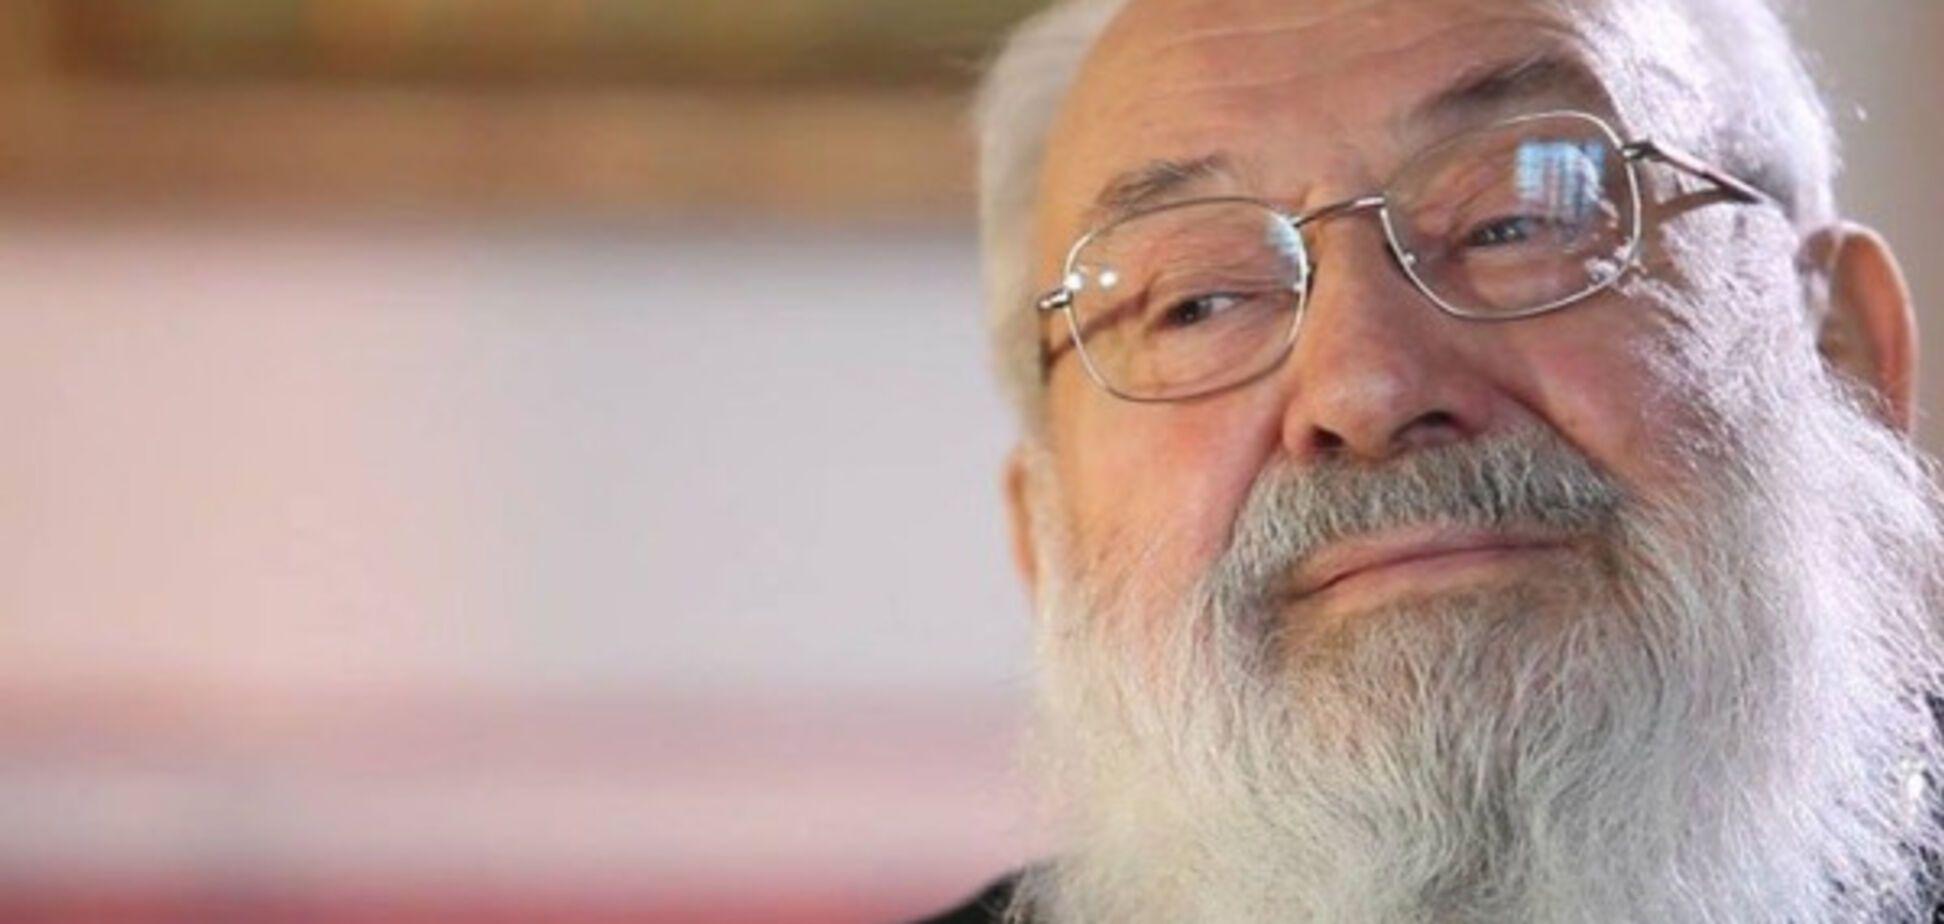 Любомир Гузар умер и никто не приходит взамен